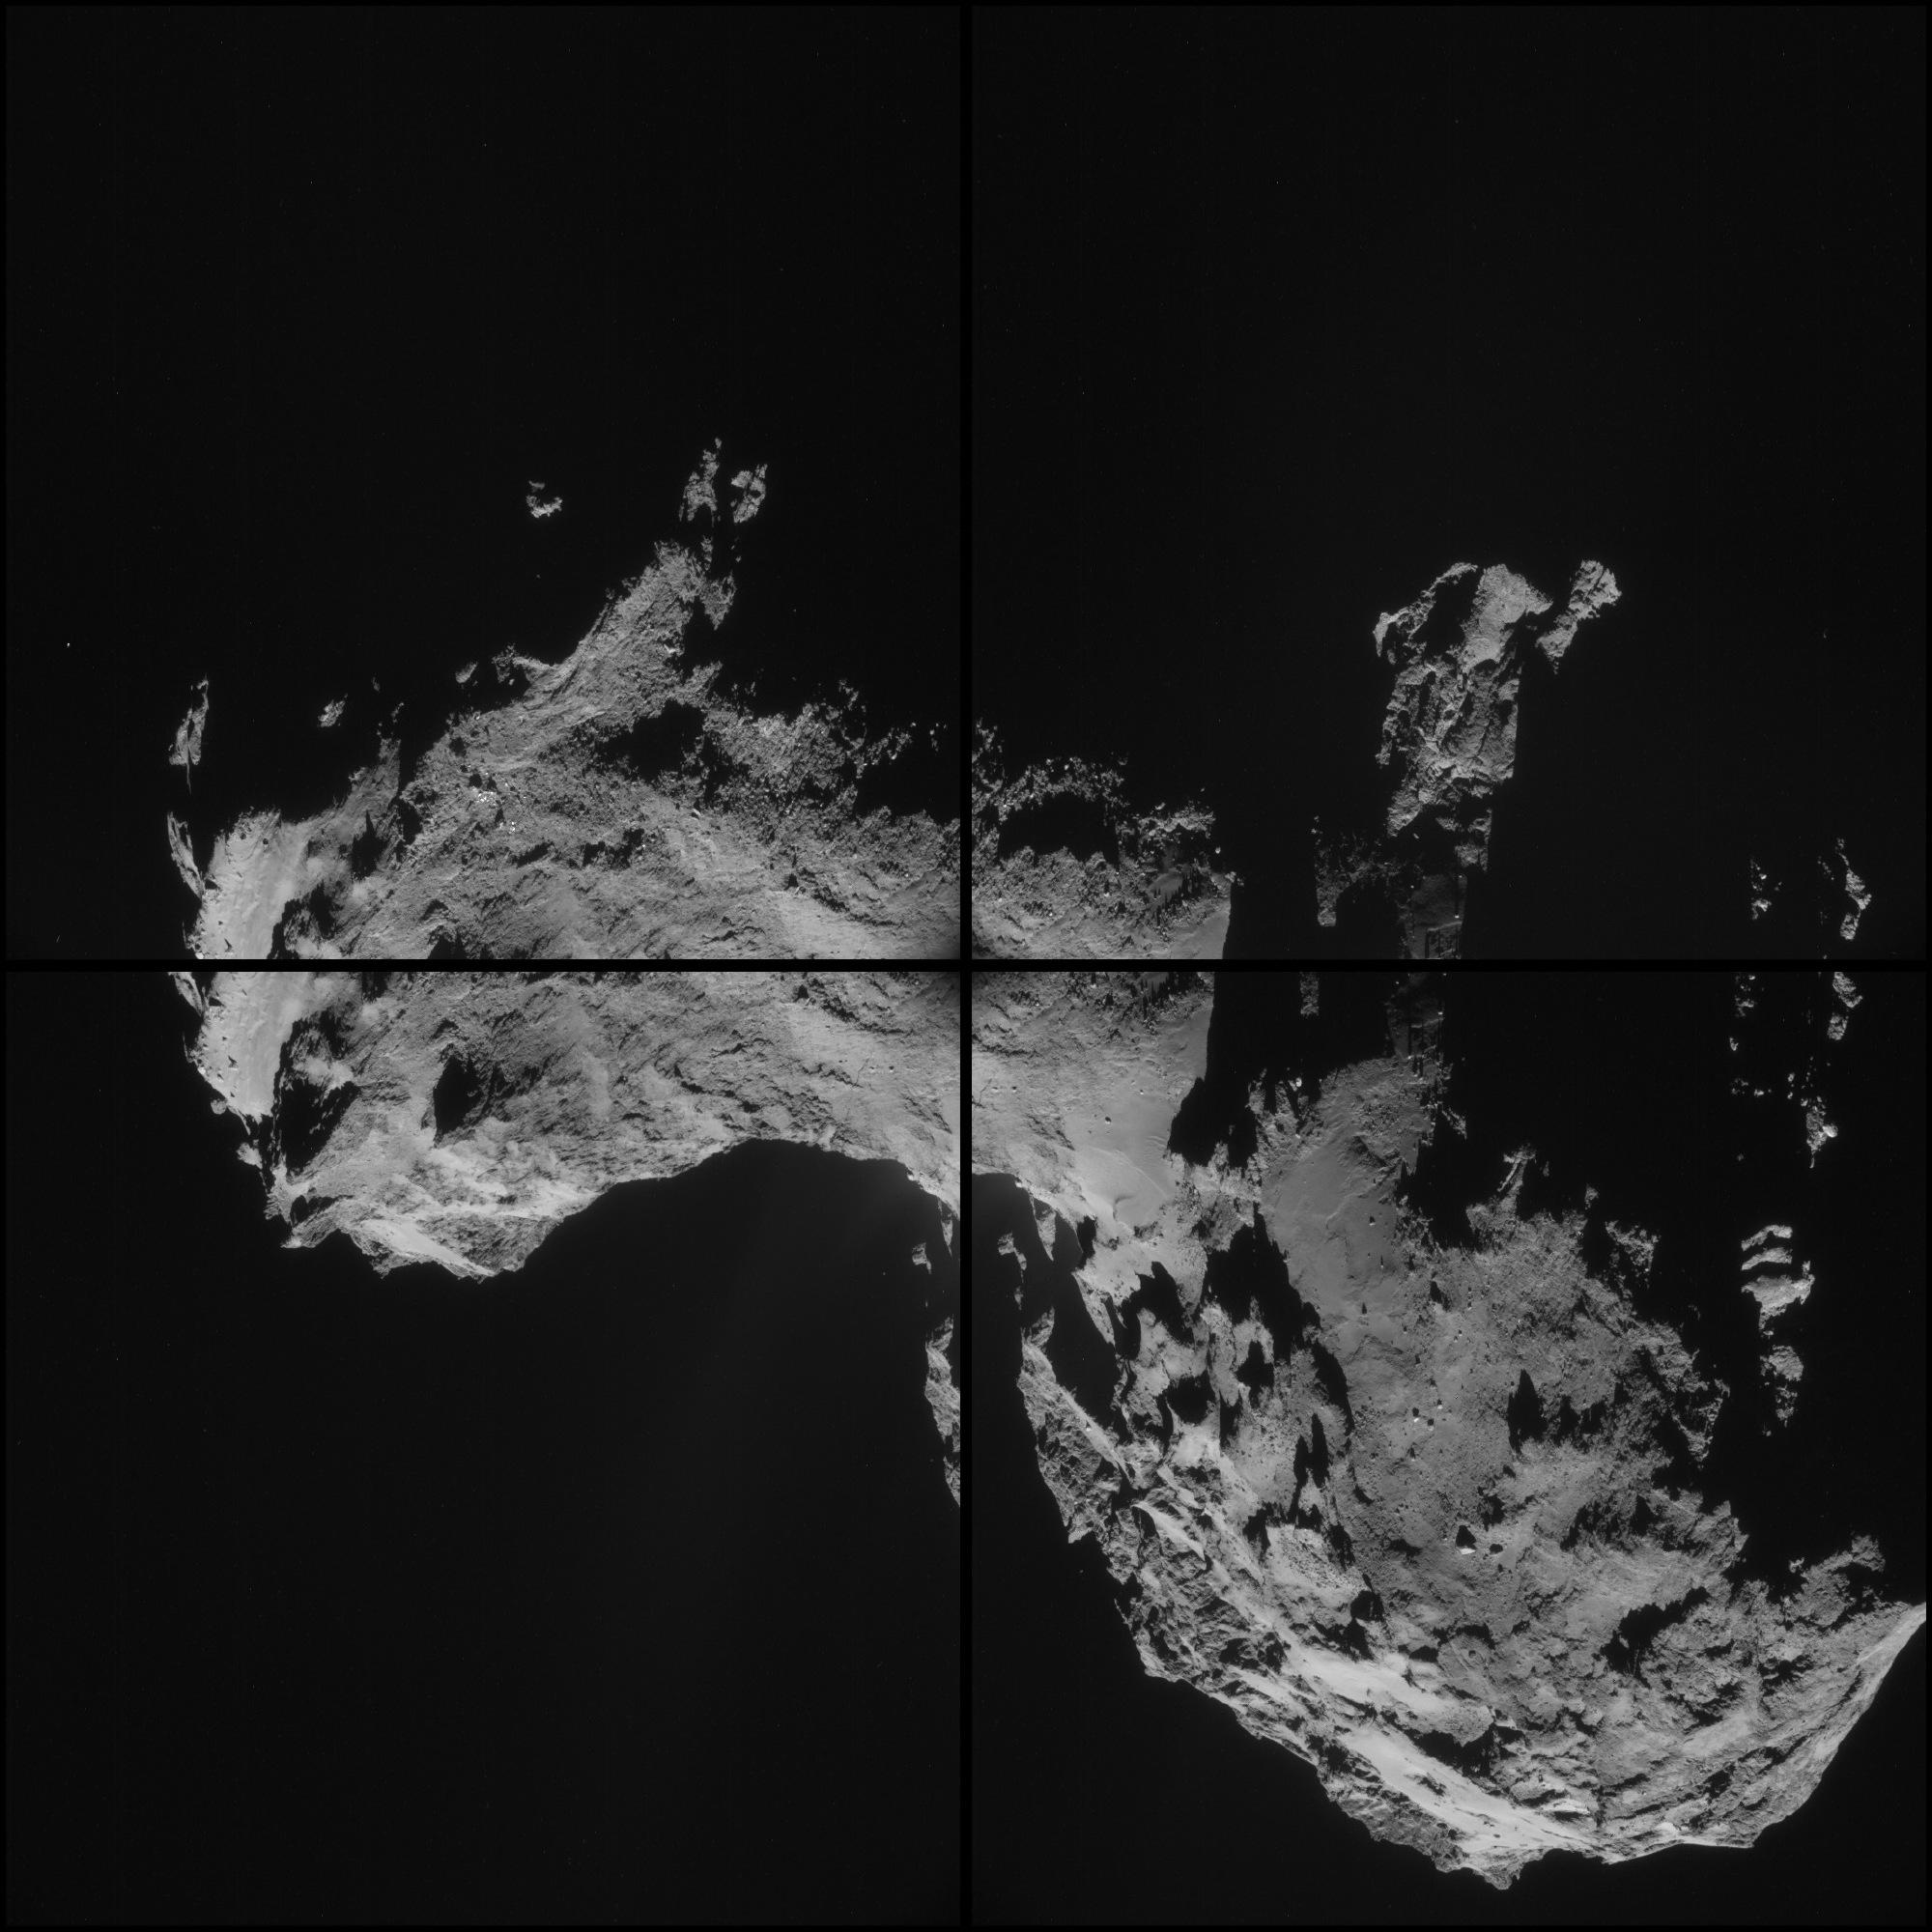 Four-Image Montage of Comet 67P/C-G